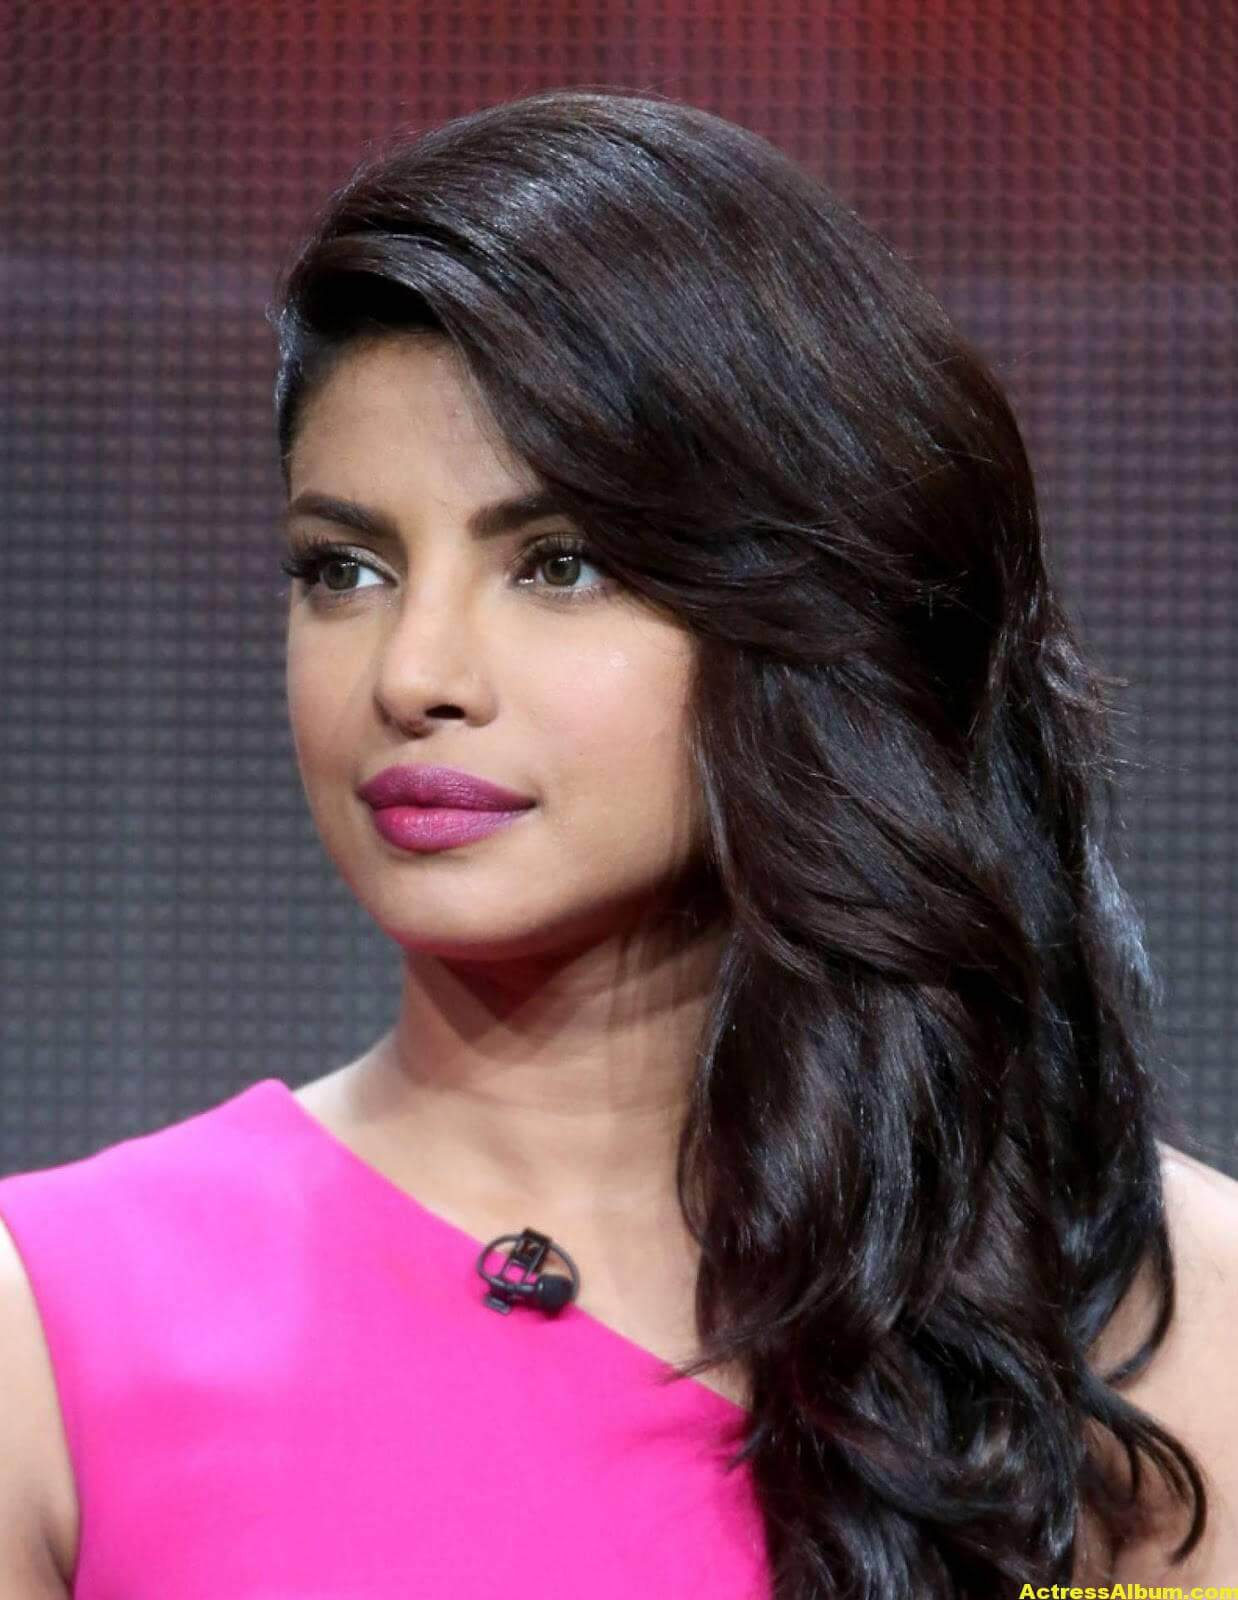 Priyanka Chopra Latest Stills in Pink Dress 1